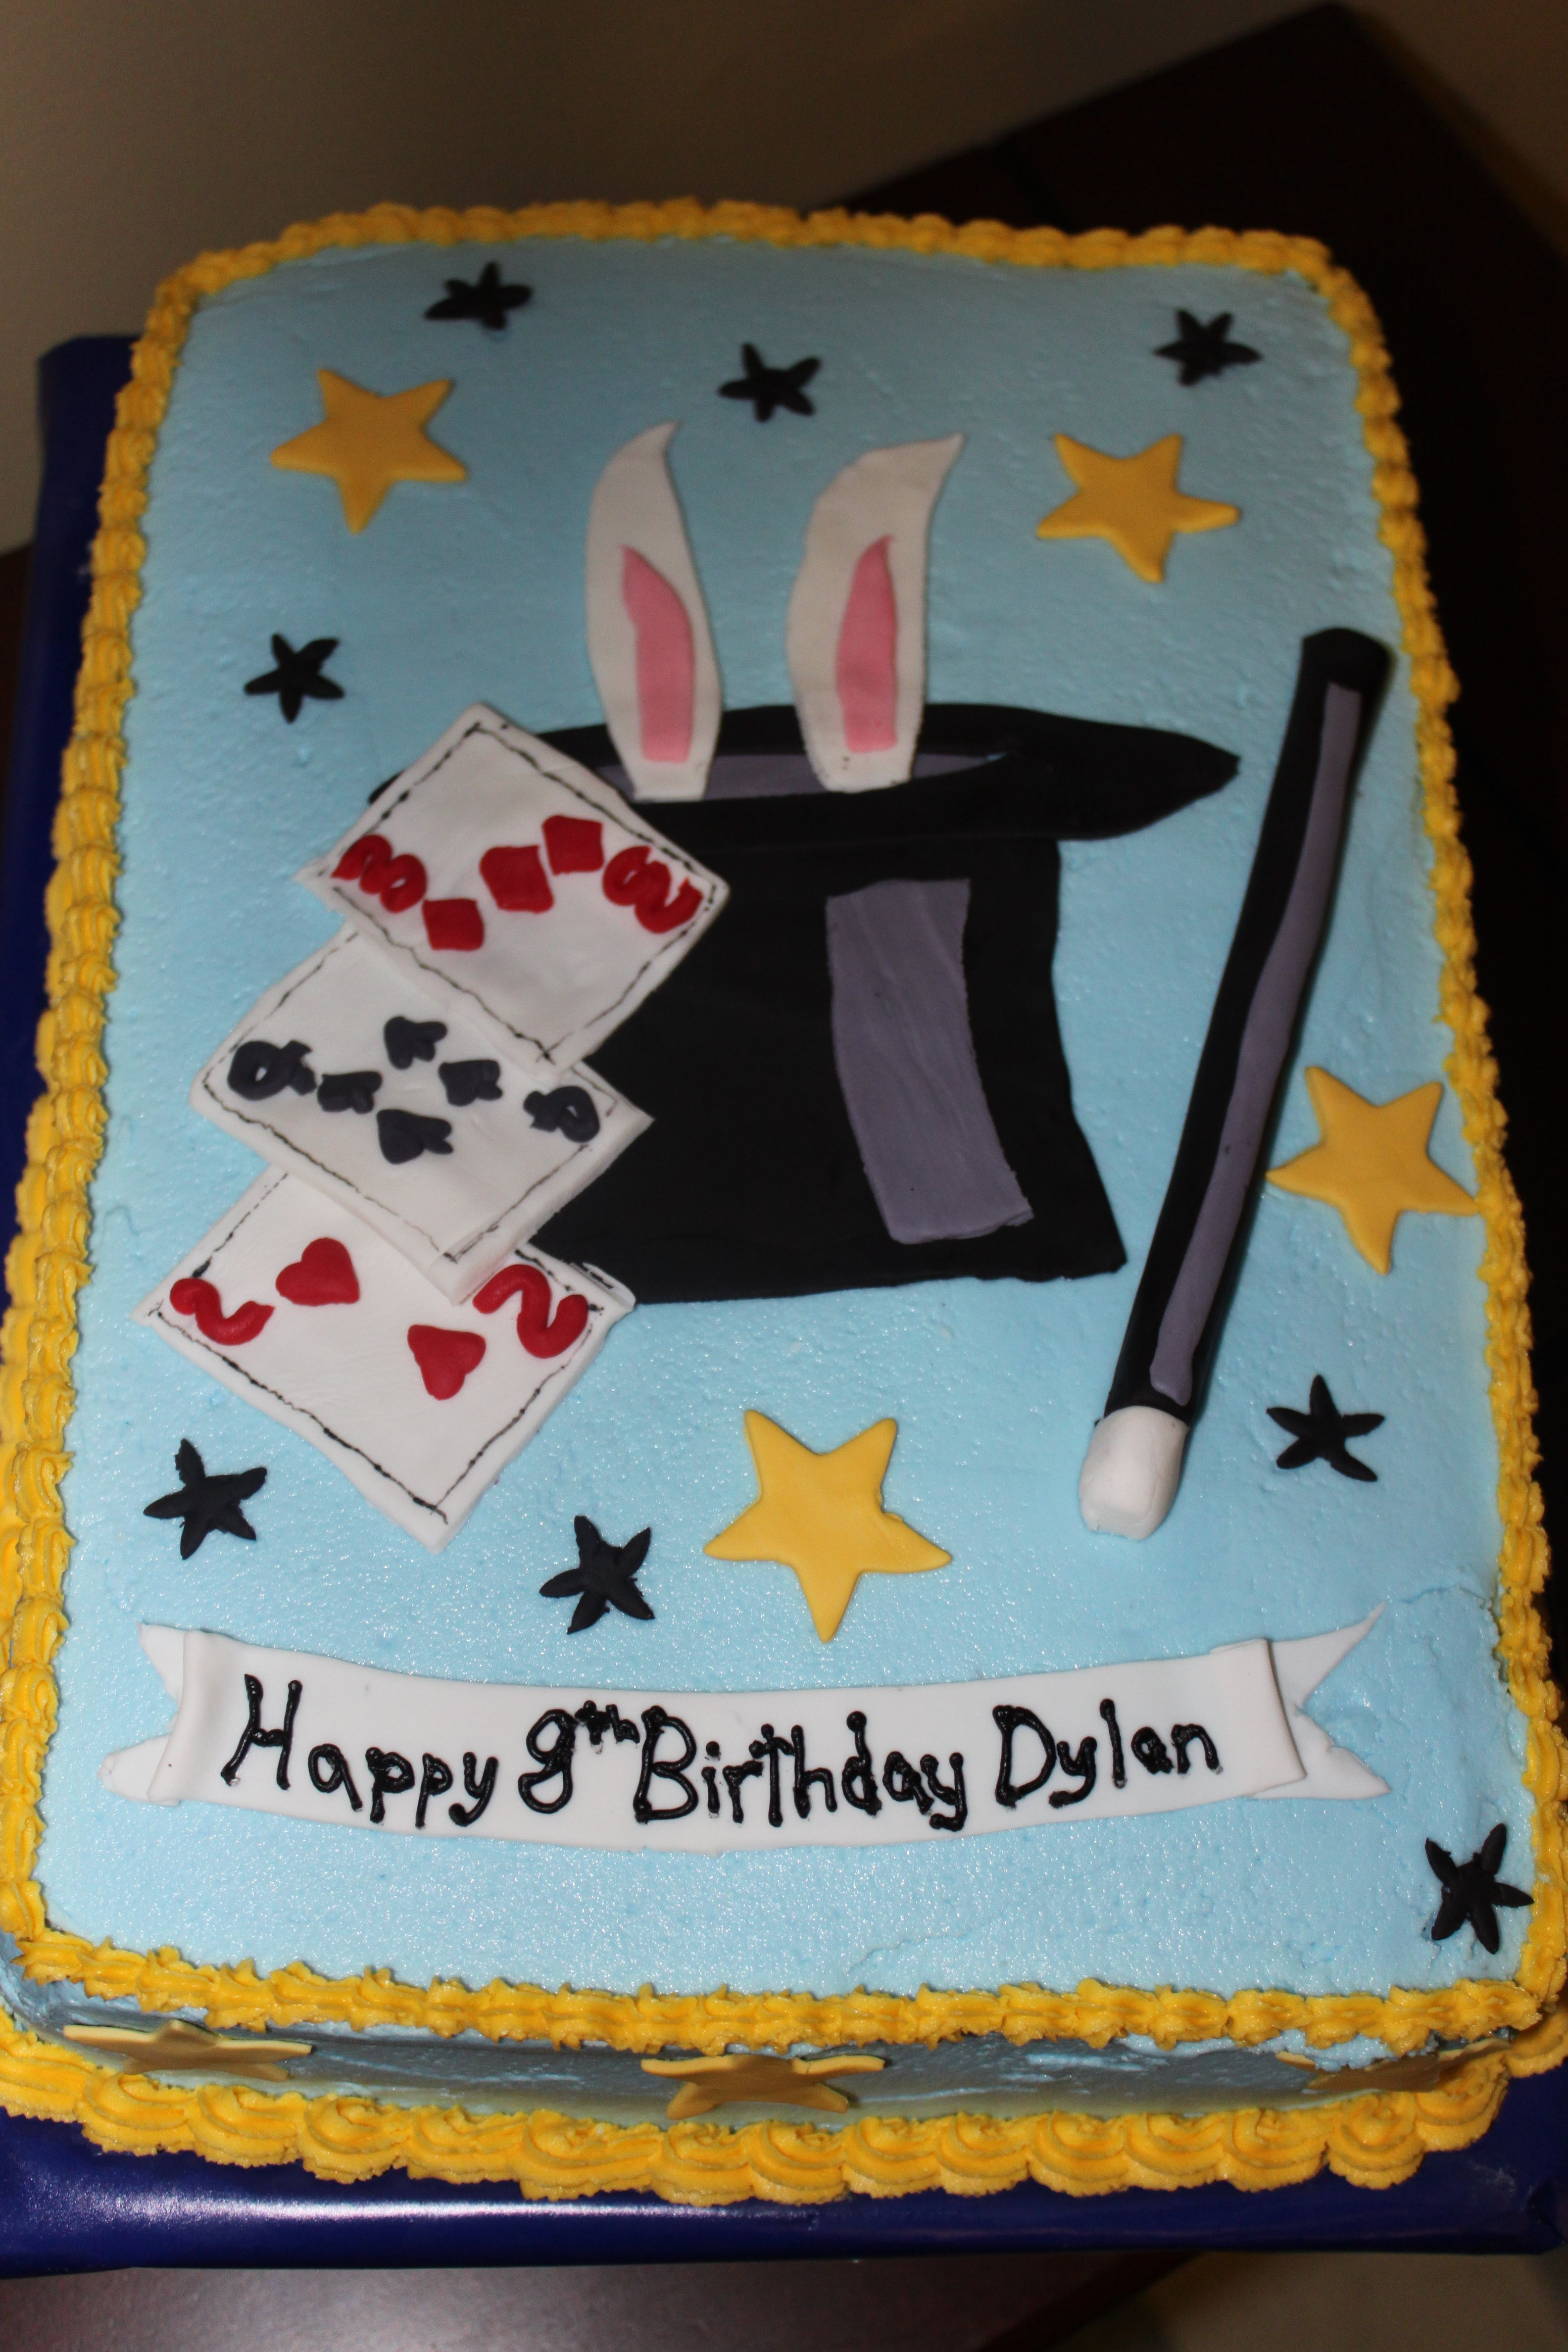 Marvelous Magician Cake With Images Magic Birthday Party Magic Birthday Funny Birthday Cards Online Elaedamsfinfo